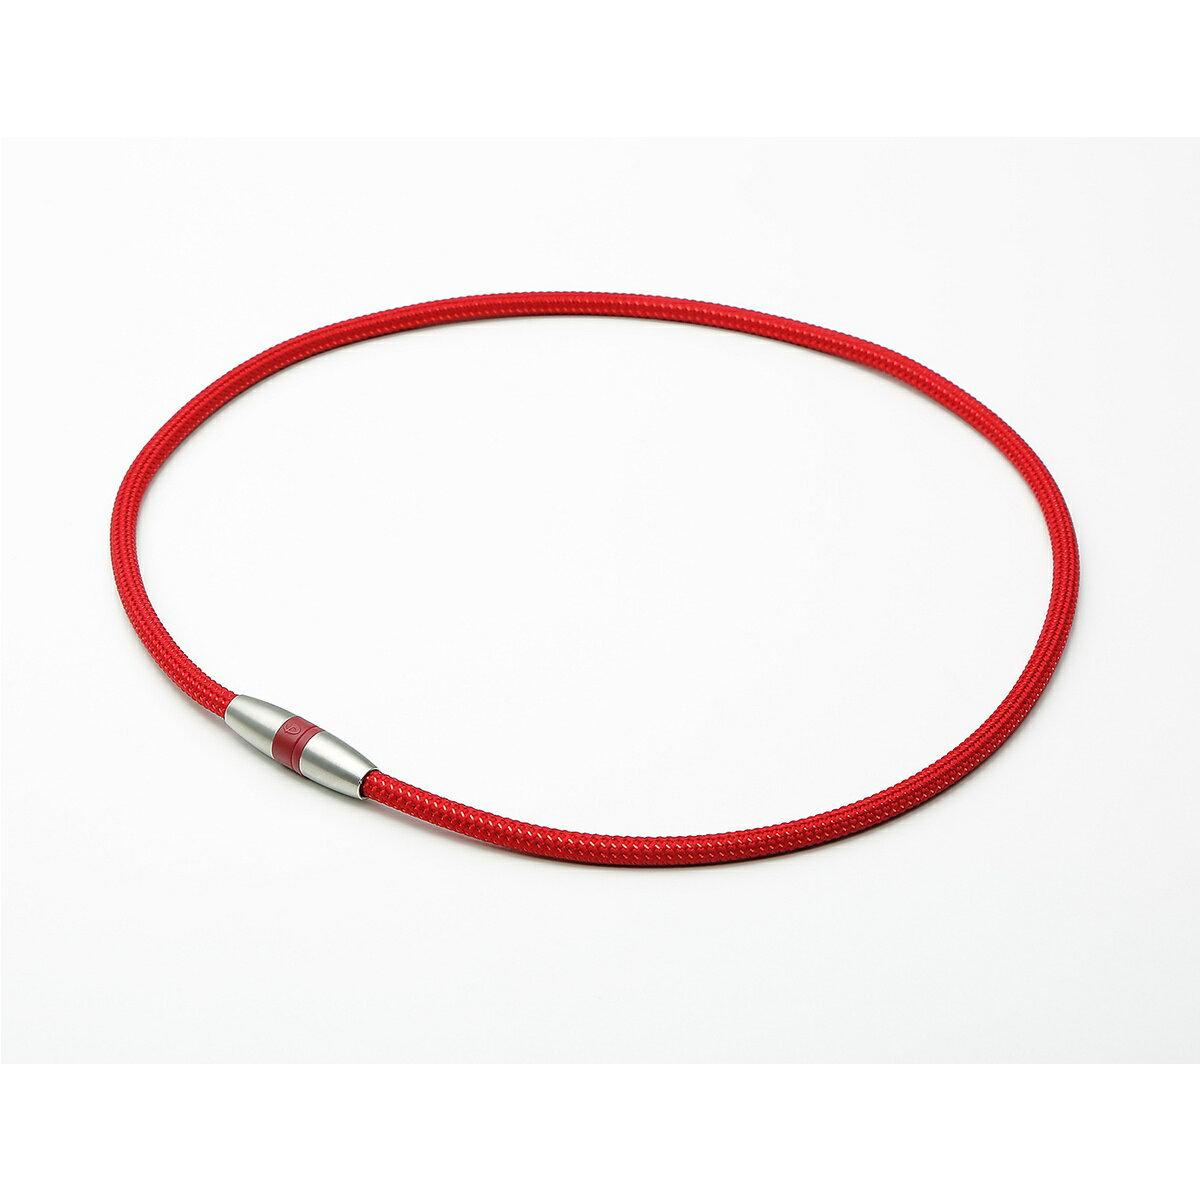 phiten (ファイテン) スポーツアクセサリー 健康アクセ RAKUWA磁気チタンネックレス ボルドー/メタリックレッド 45CM 45CM BLU 0217TG743152